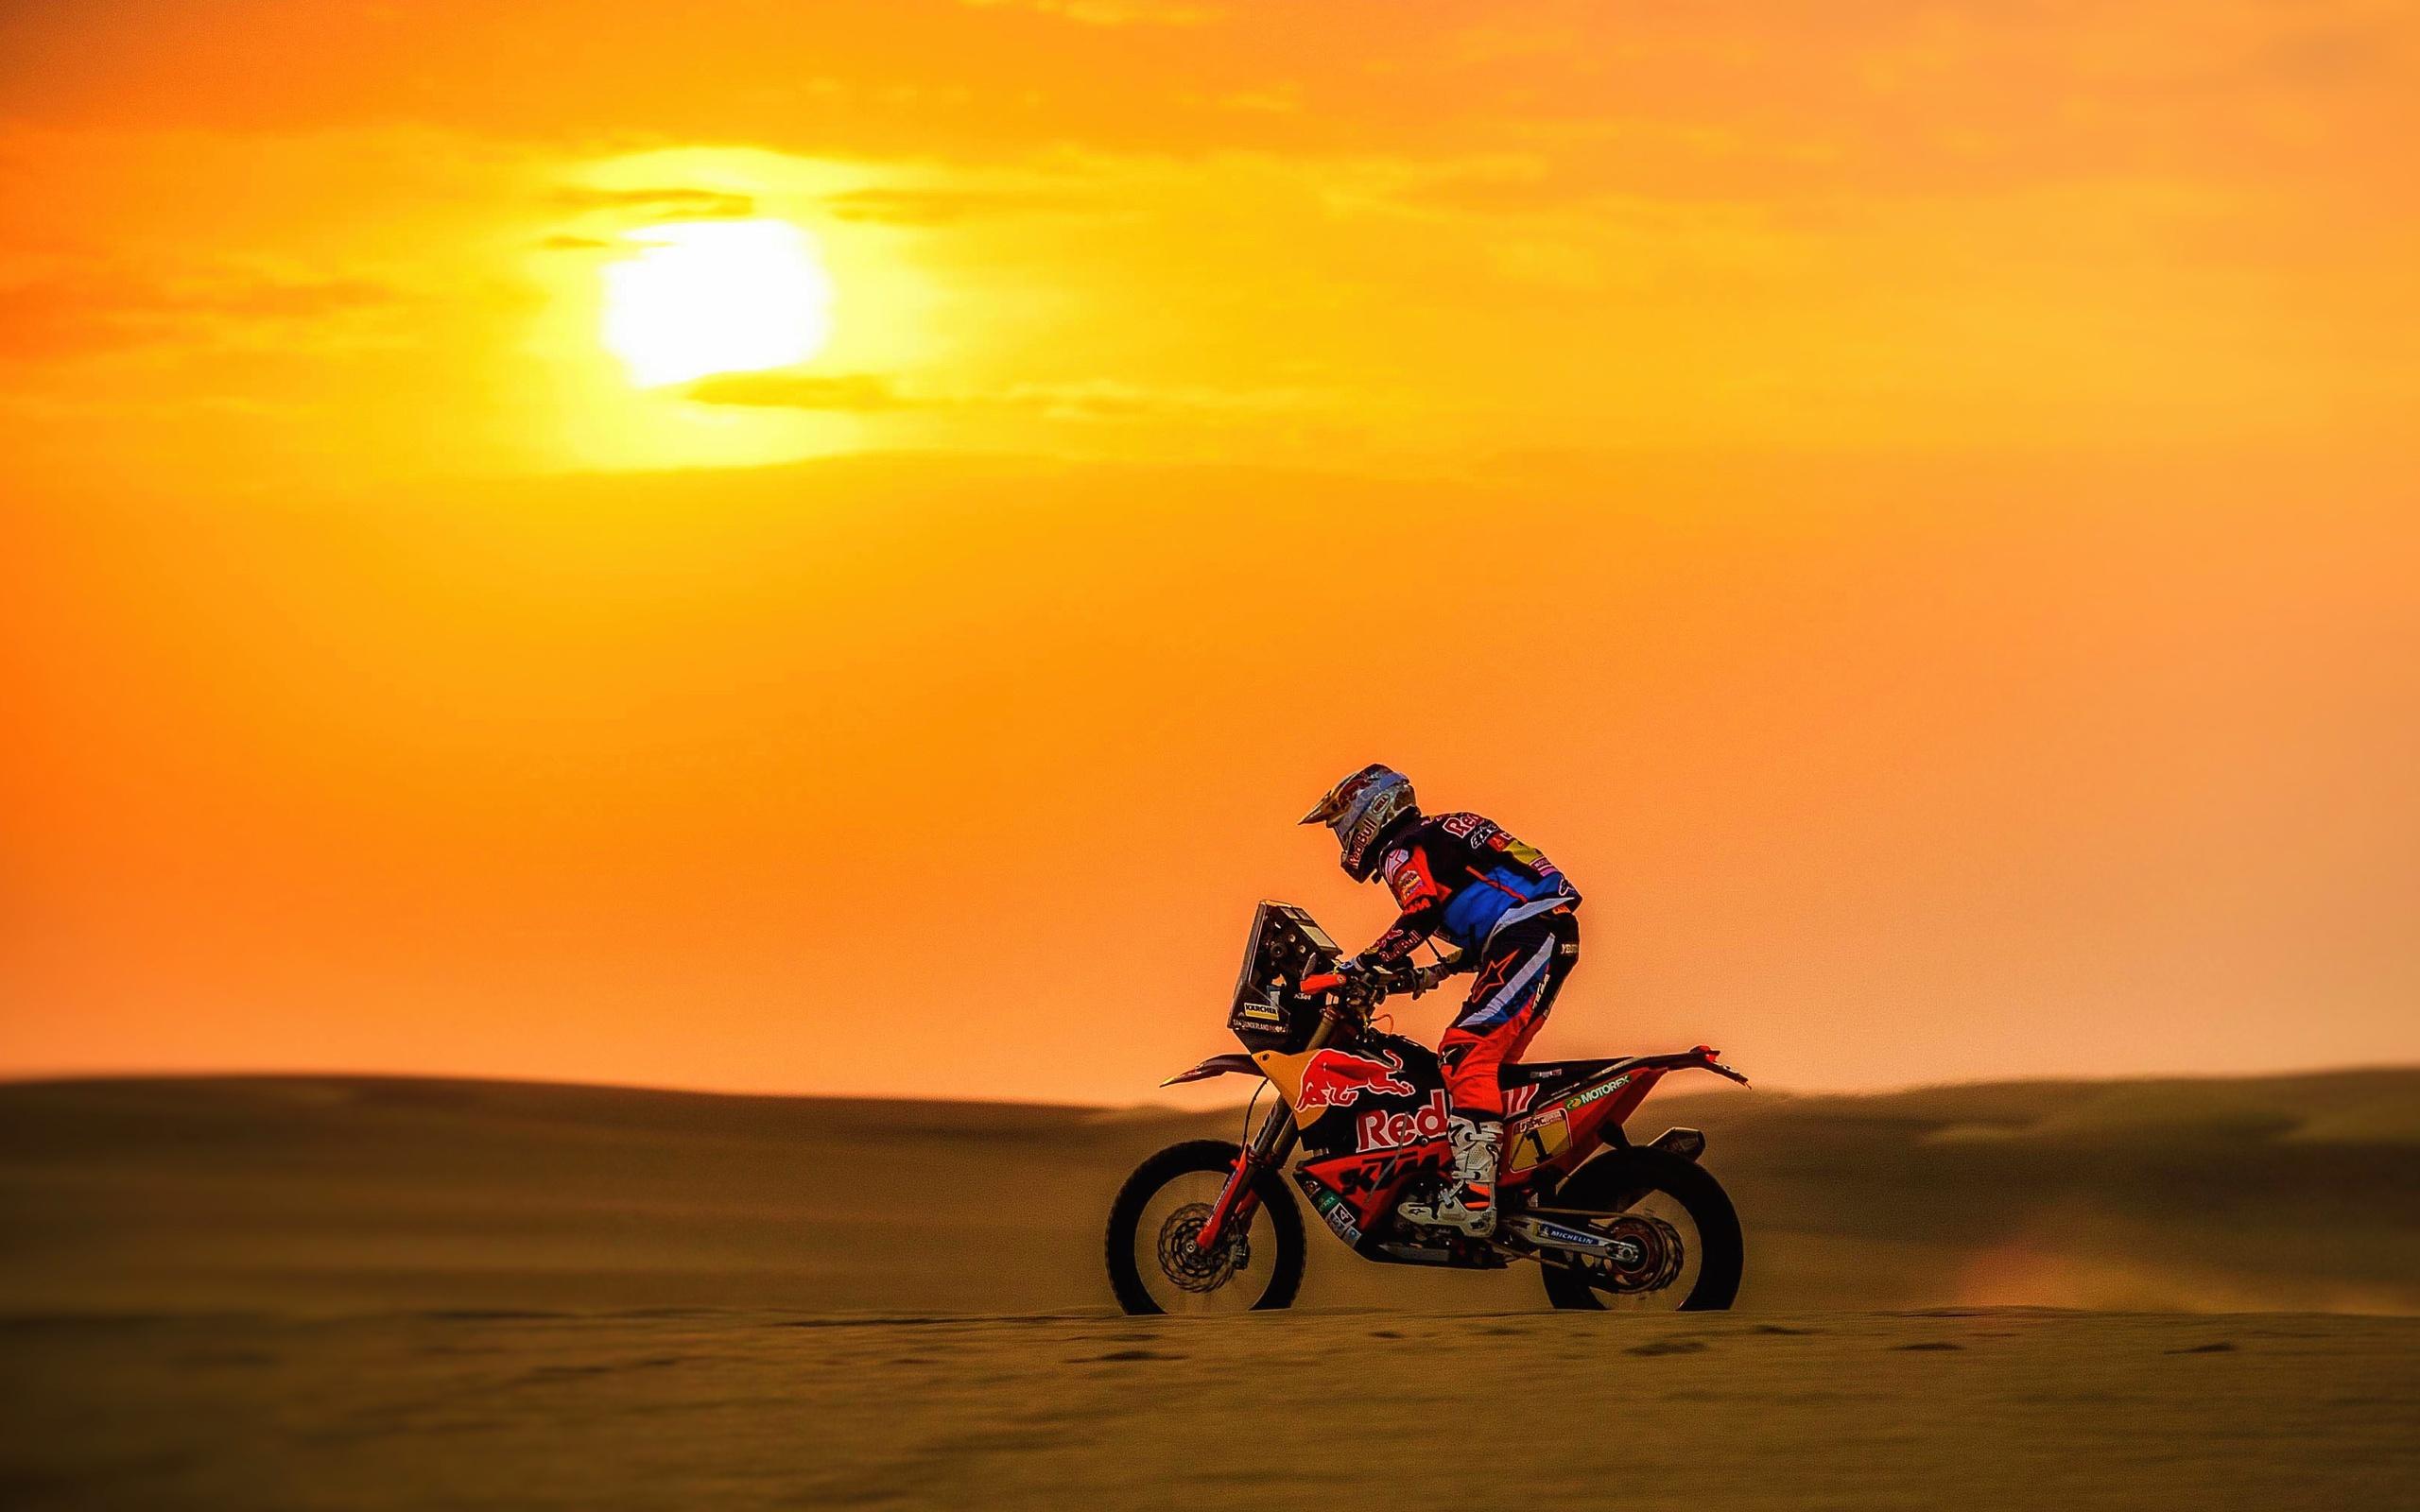 2560x1600 Auto Racer Motorcycle Ktm Cars Bike Sport Sunset 2560x1600